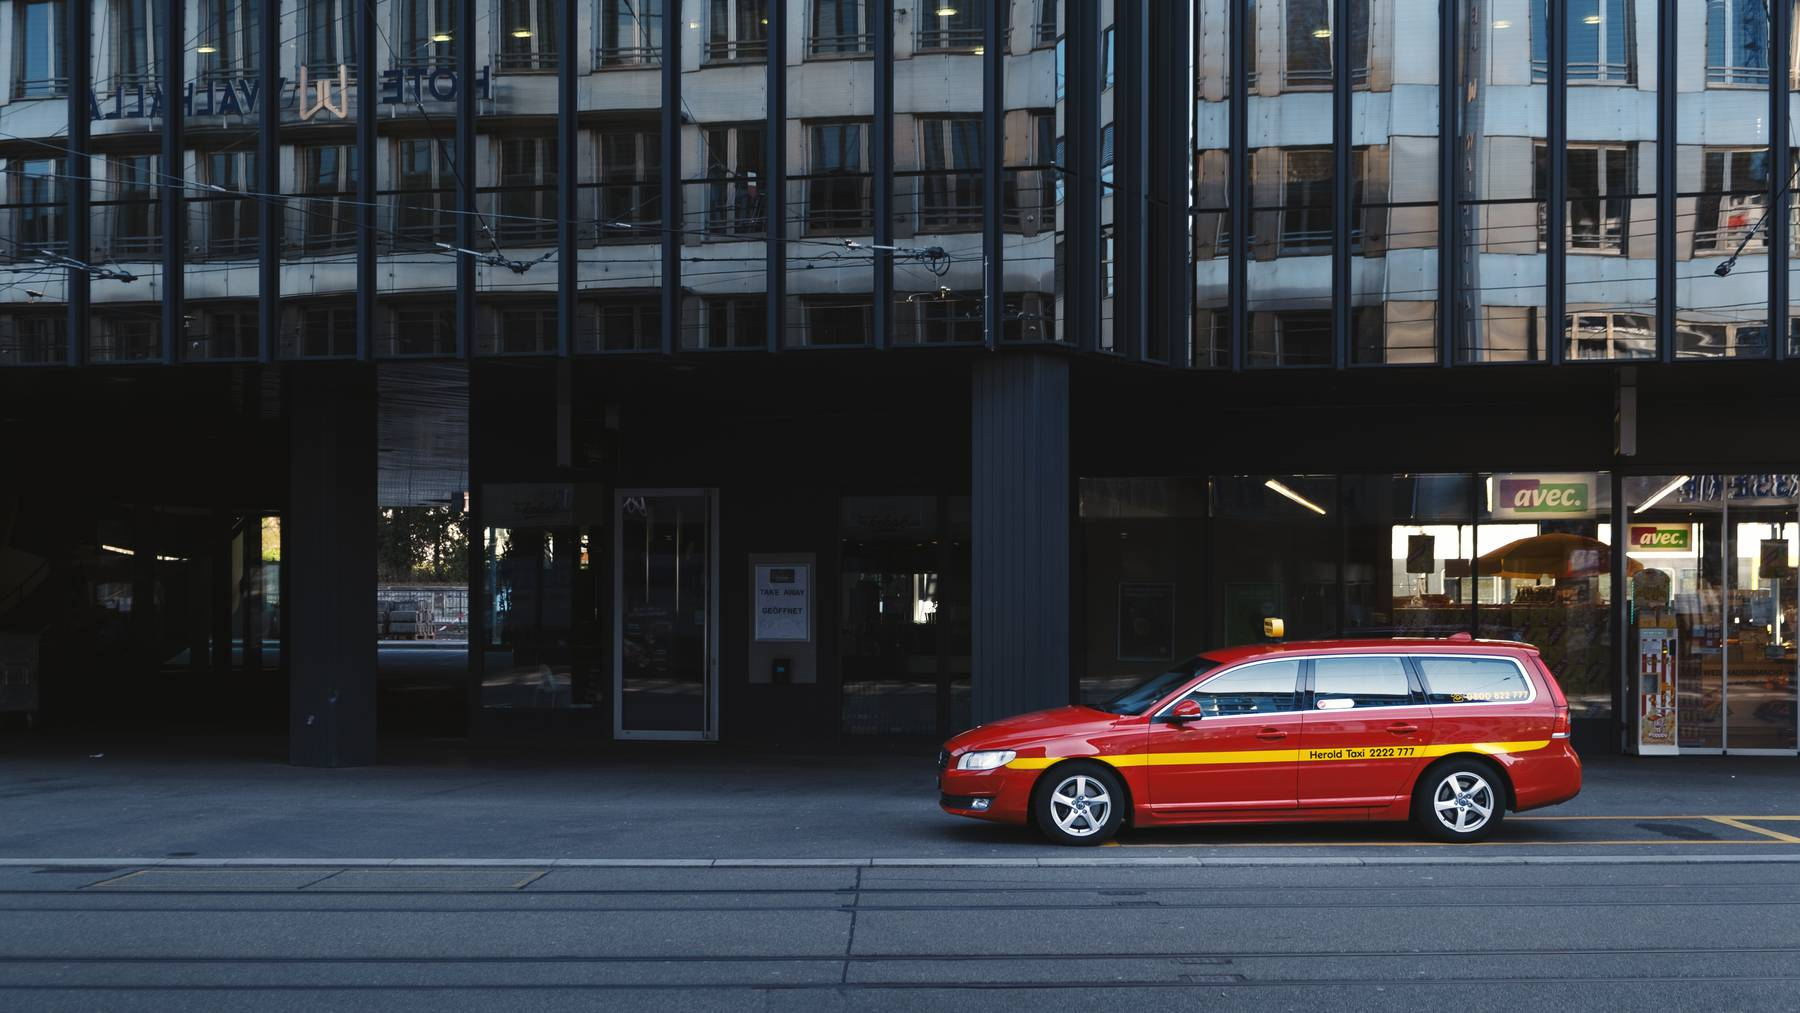 Taxi St.Gallen